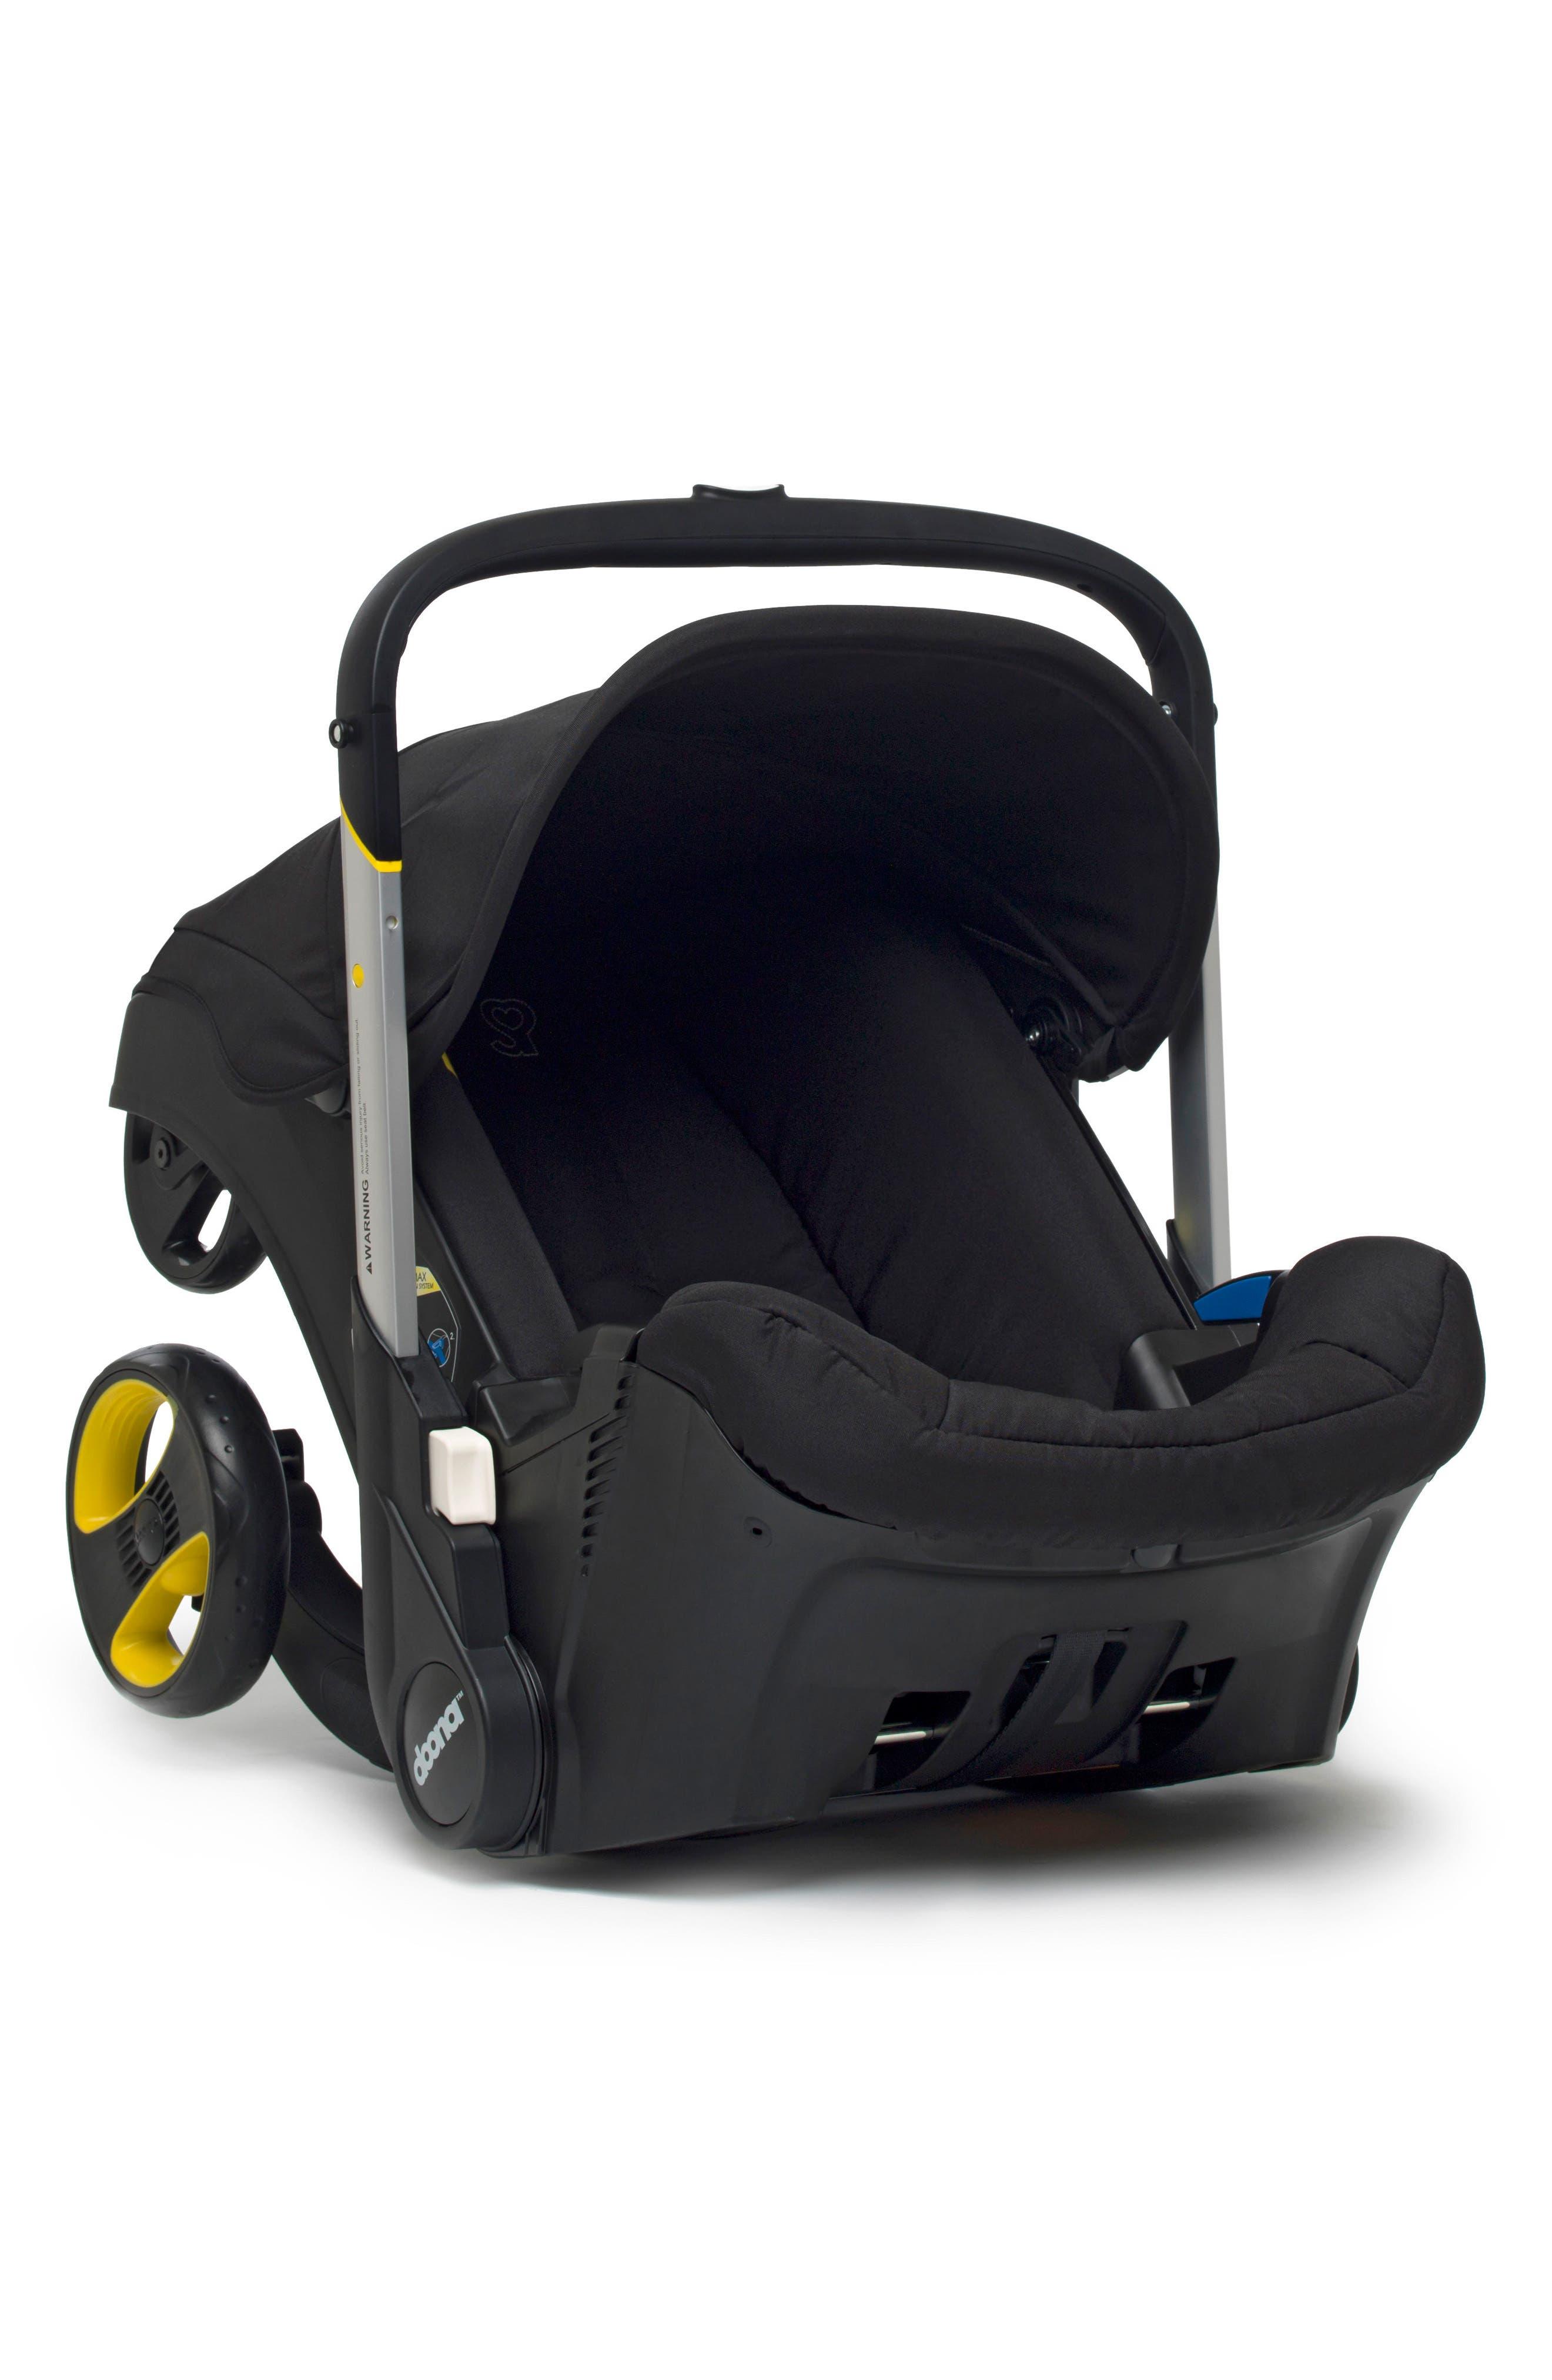 Doona Car Seats: Booster Seats, Baby Car Seats & More | Nordstrom